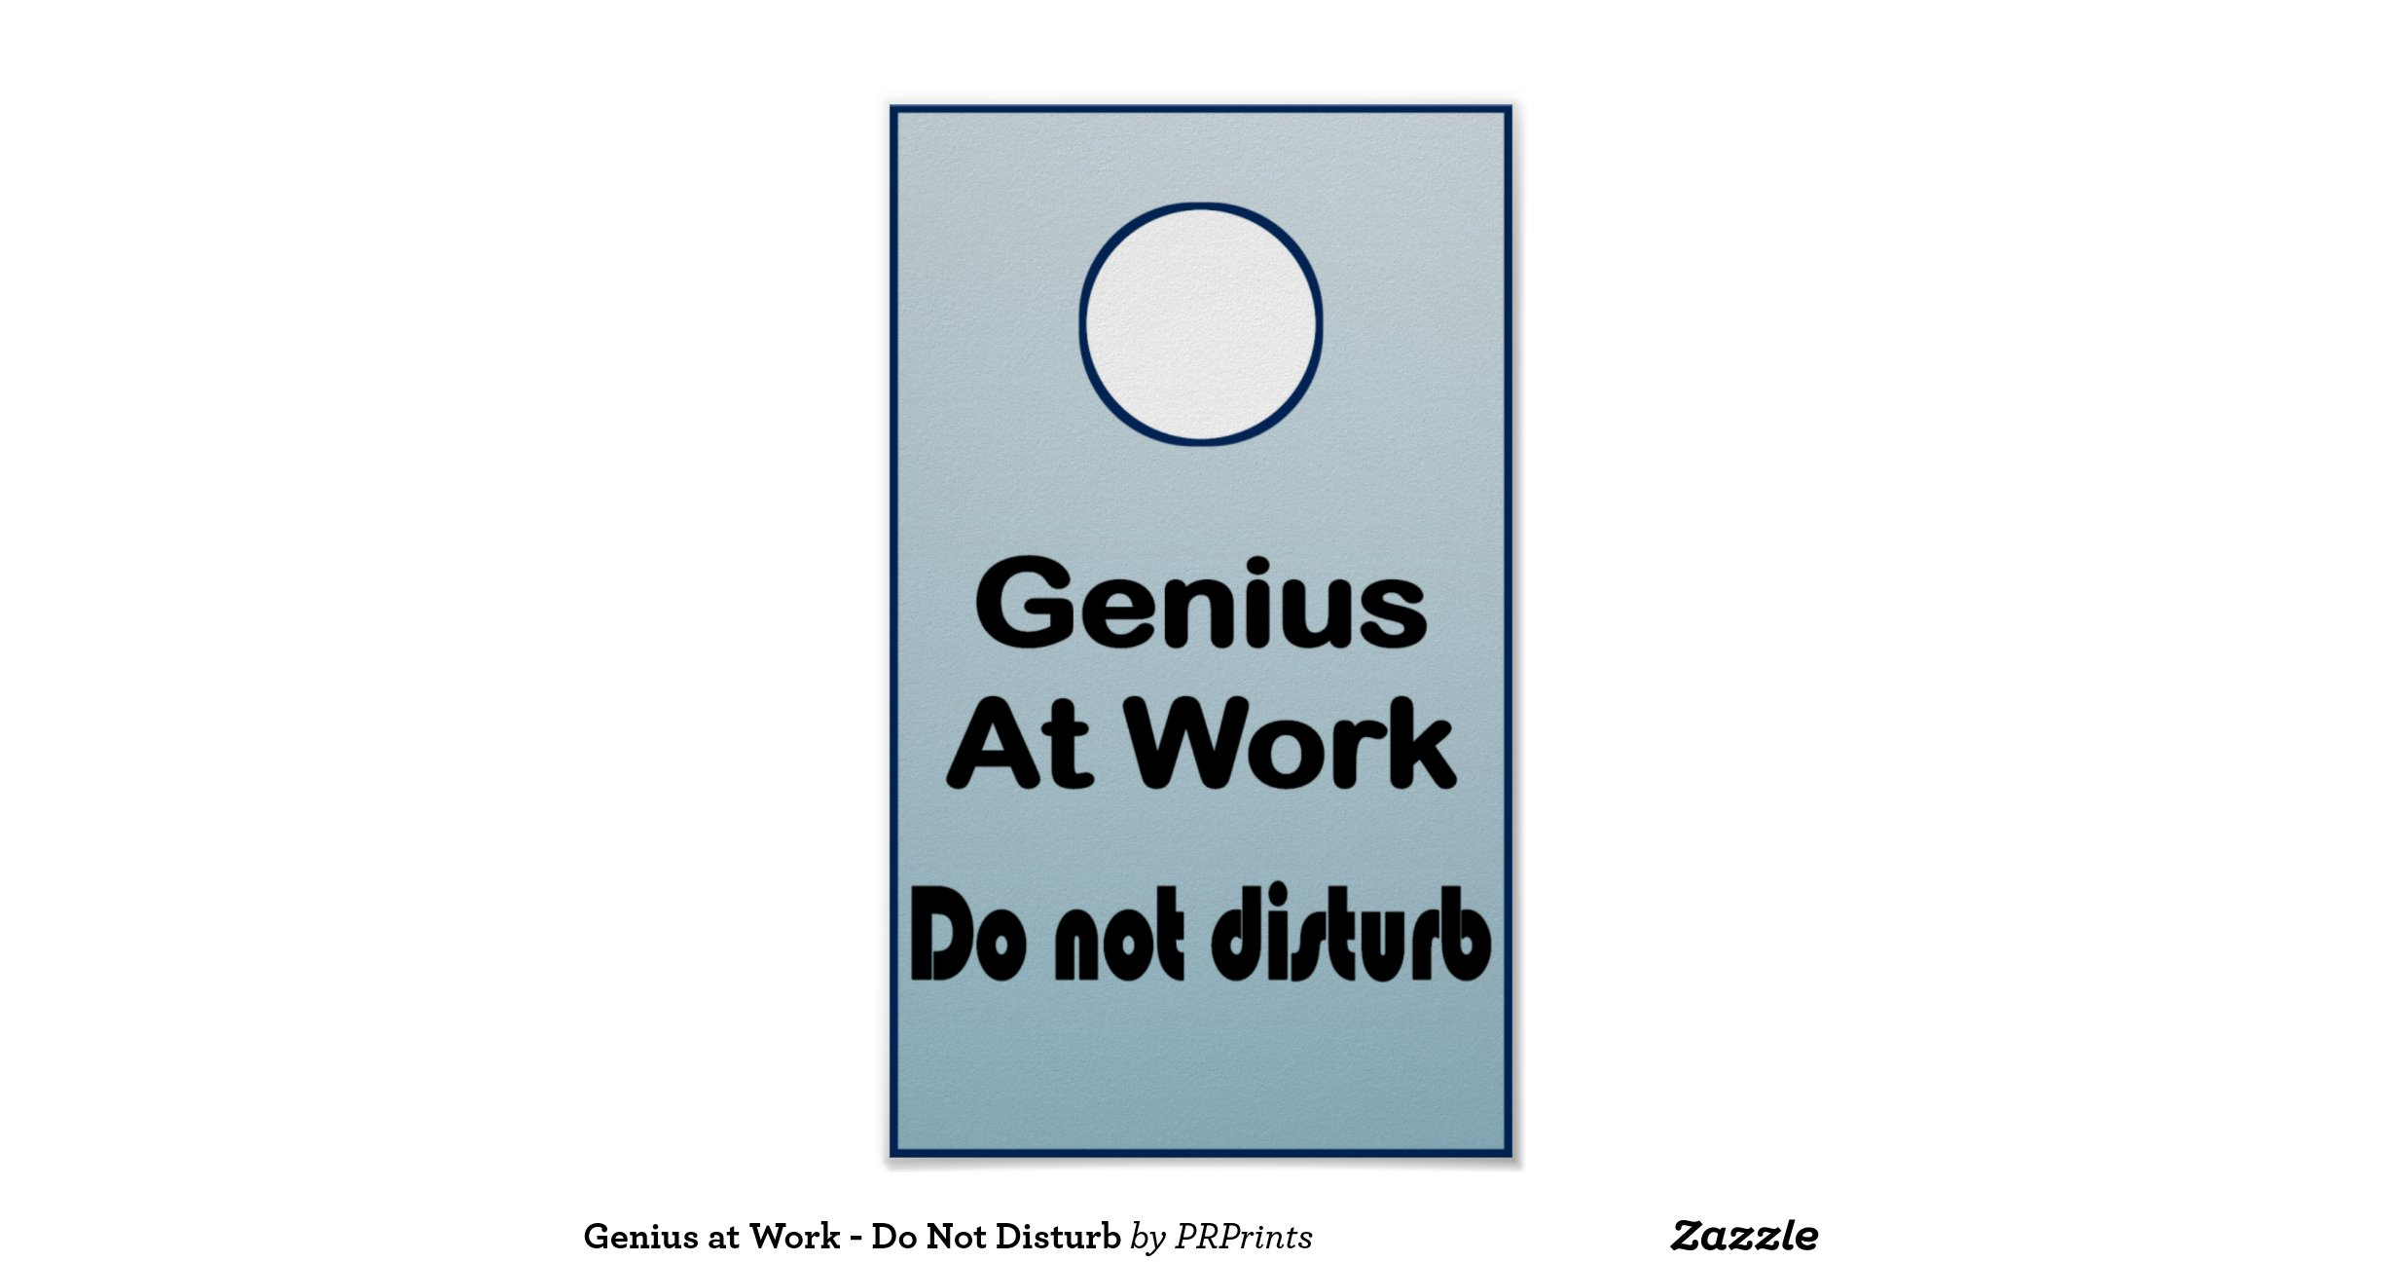 Geniusatworkdonotdisturbposter